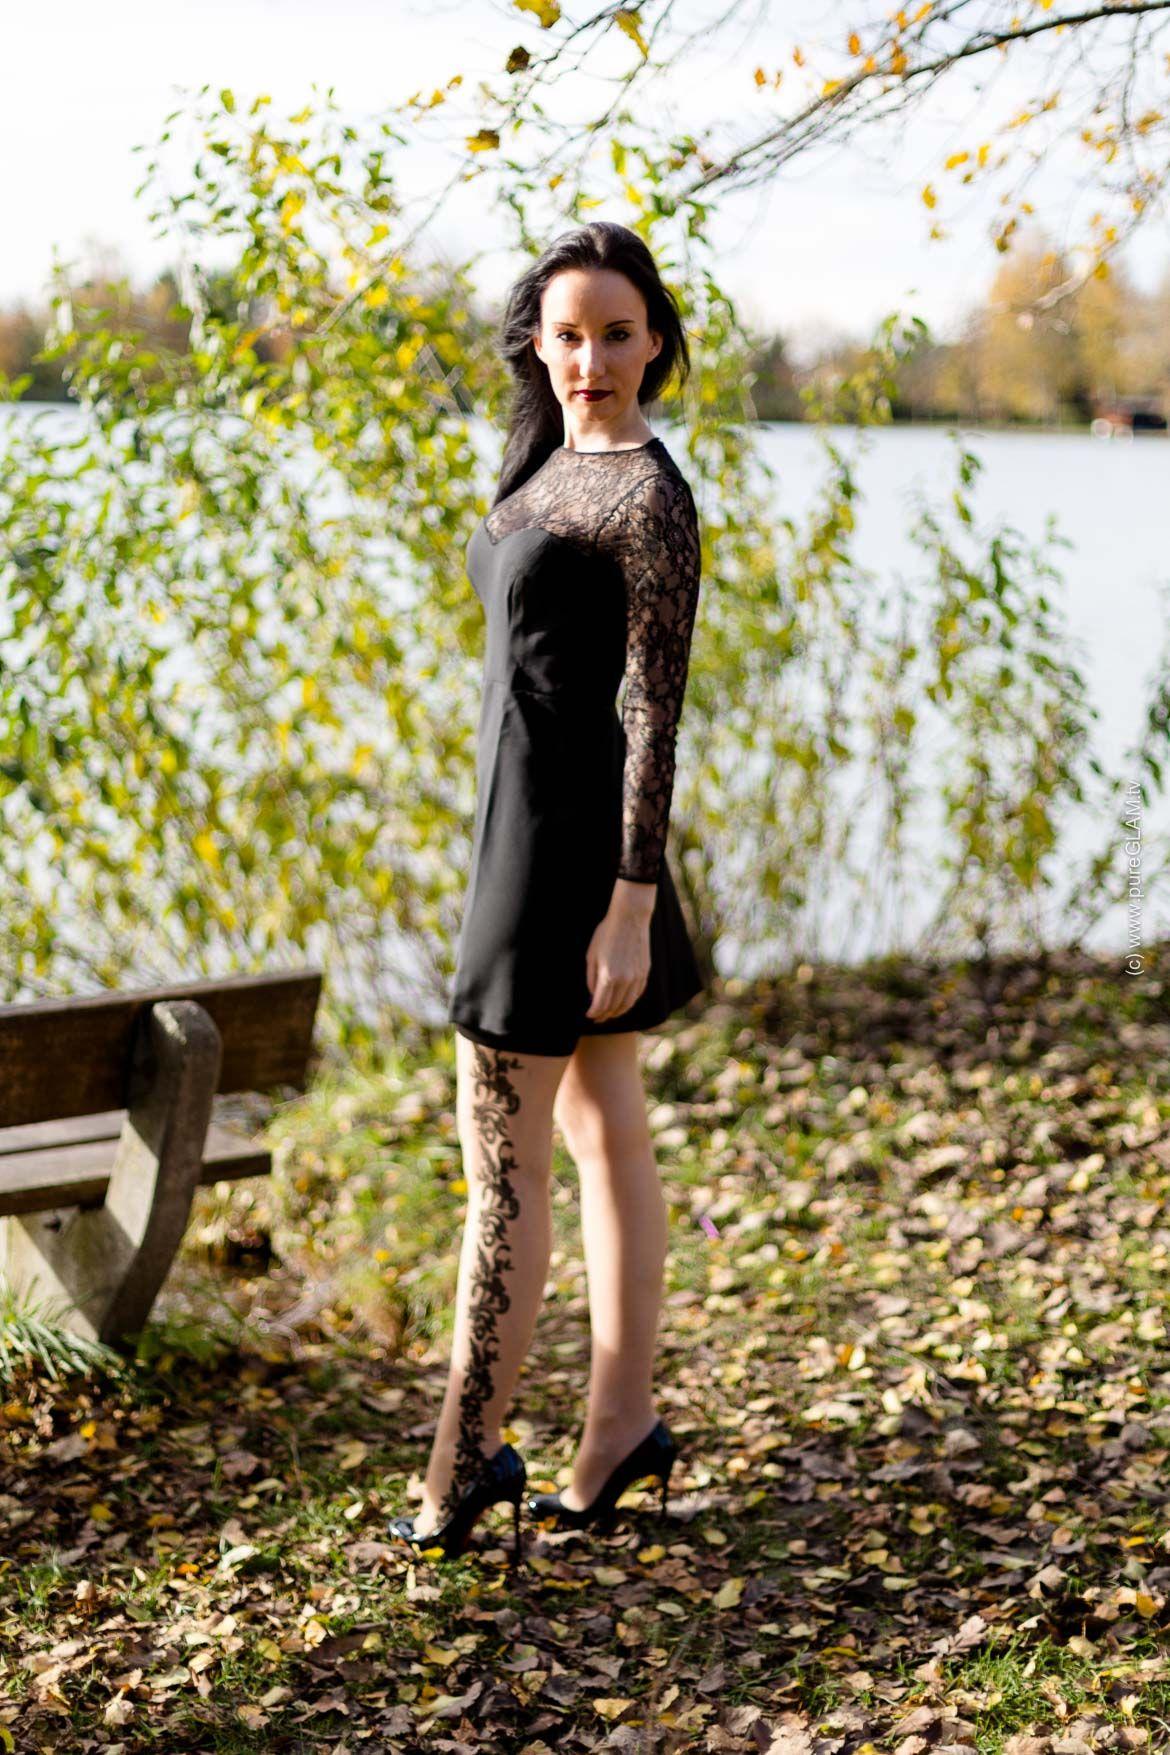 minikleid mit spitzen strumpfhose eleganter fashion look minis and fashion. Black Bedroom Furniture Sets. Home Design Ideas